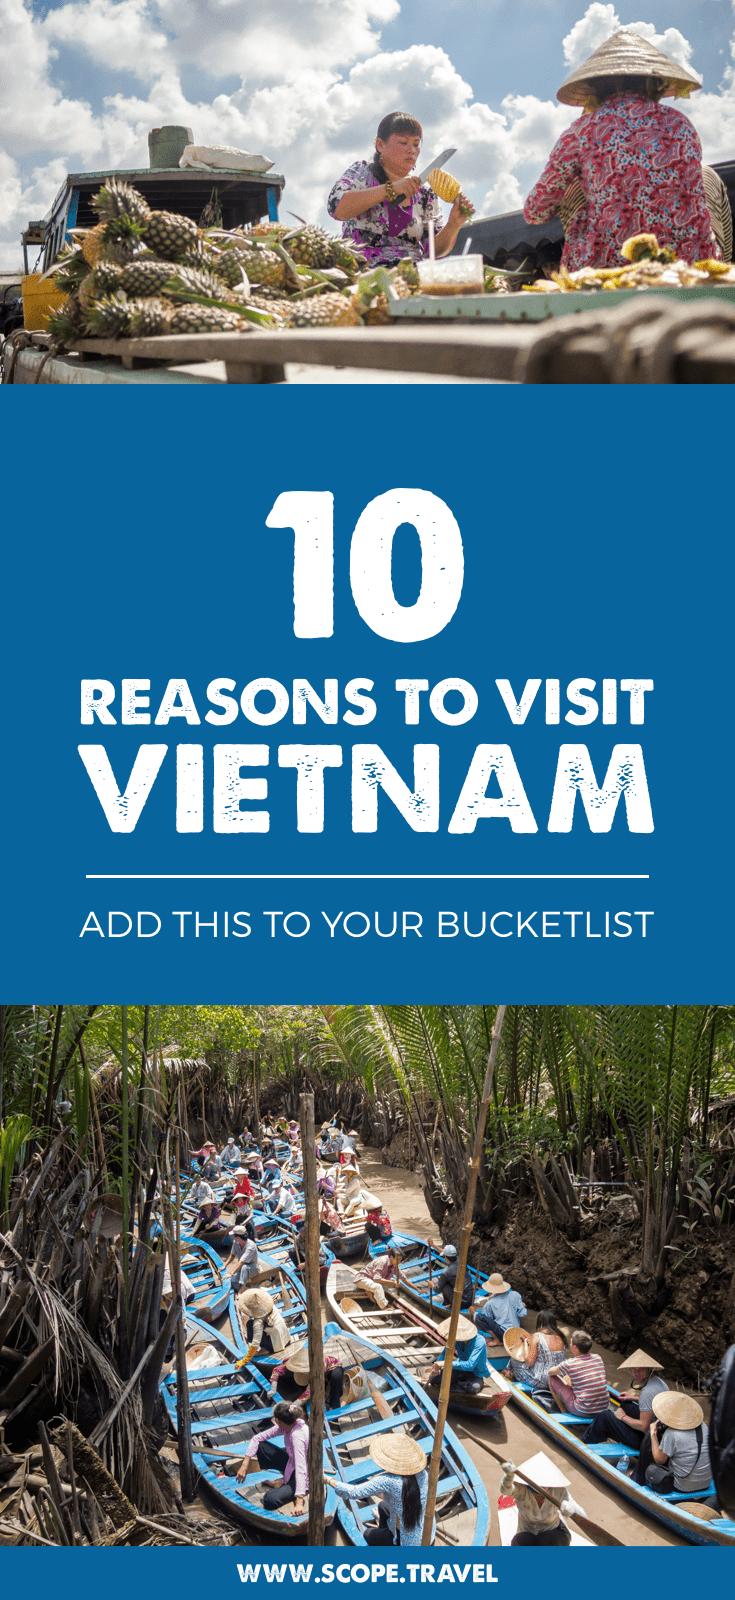 Pinterest 10 reasons to visit vietnam